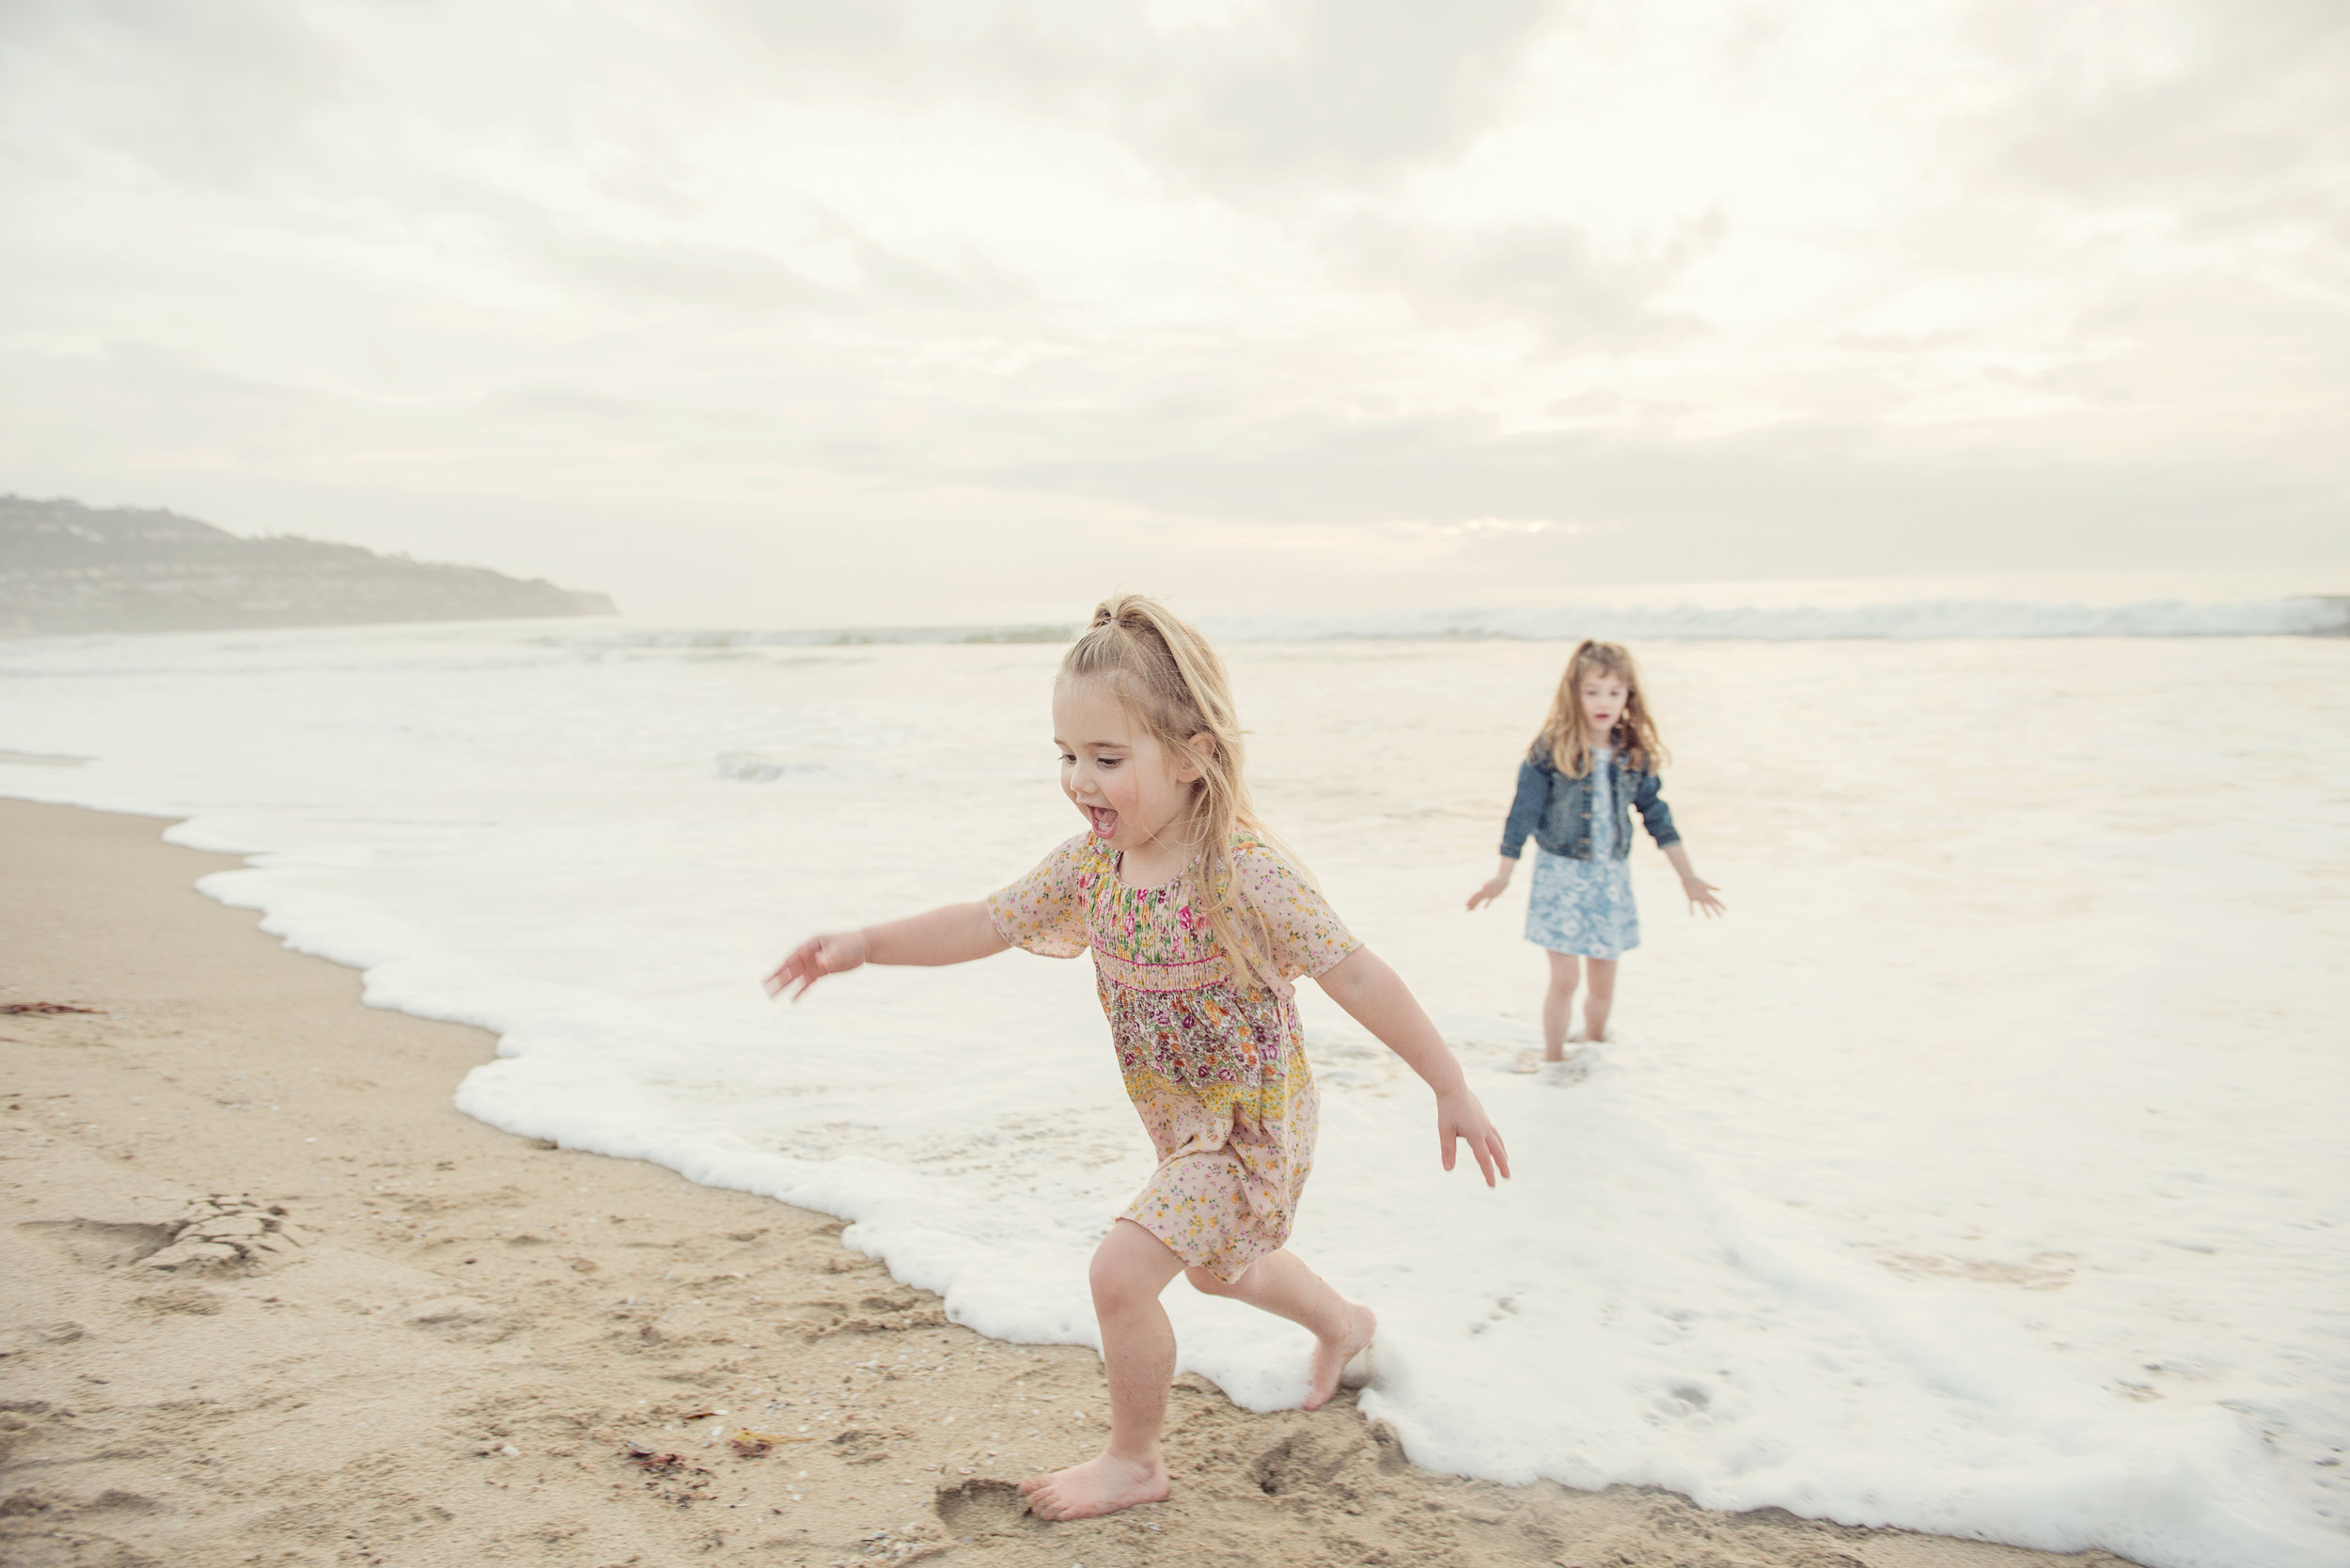 sample_beach-4.jpg